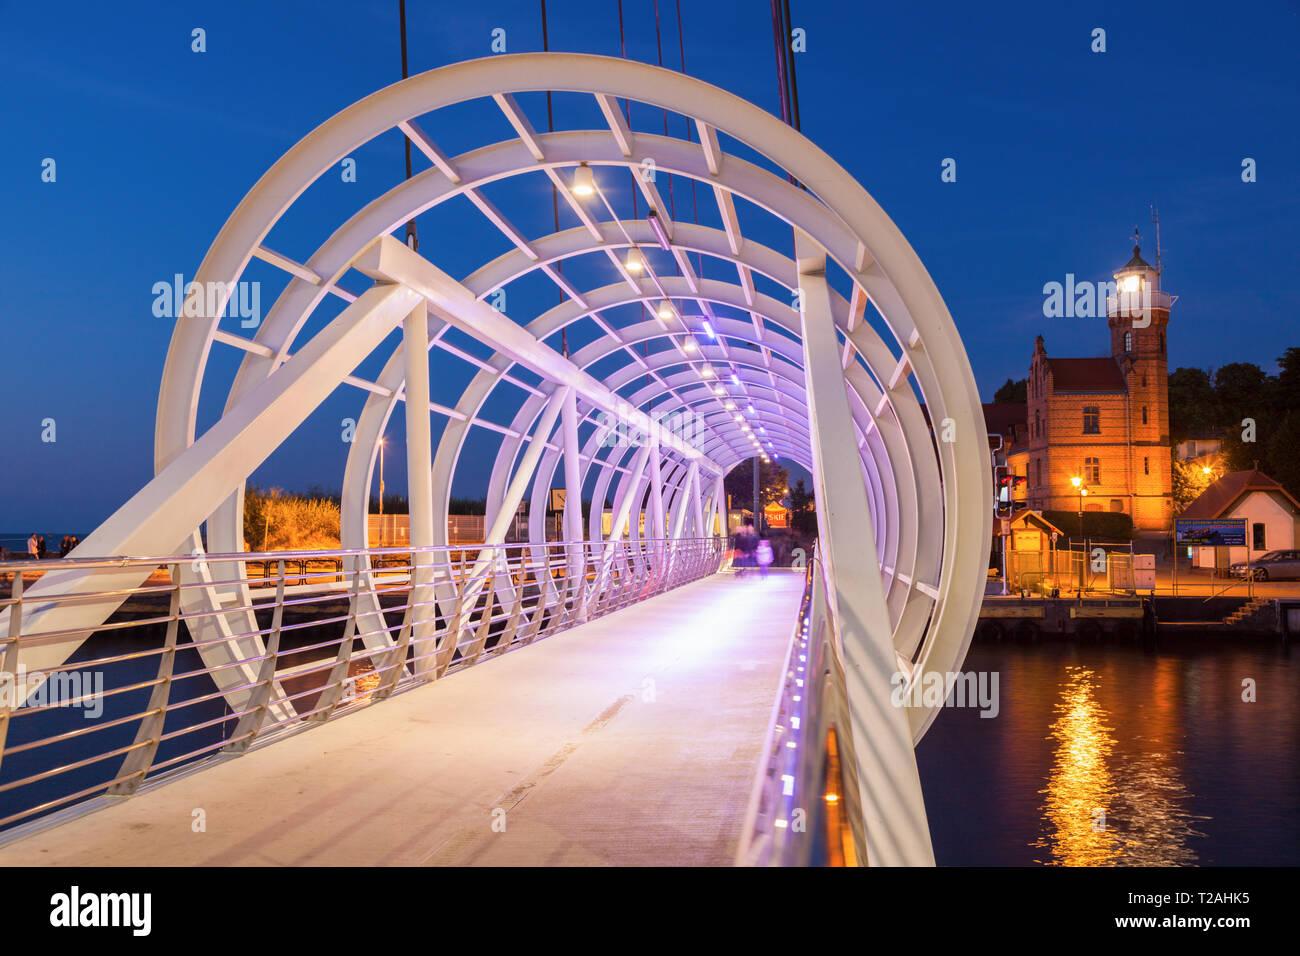 Ponte pedonale a Ustka, Polonia Foto Stock